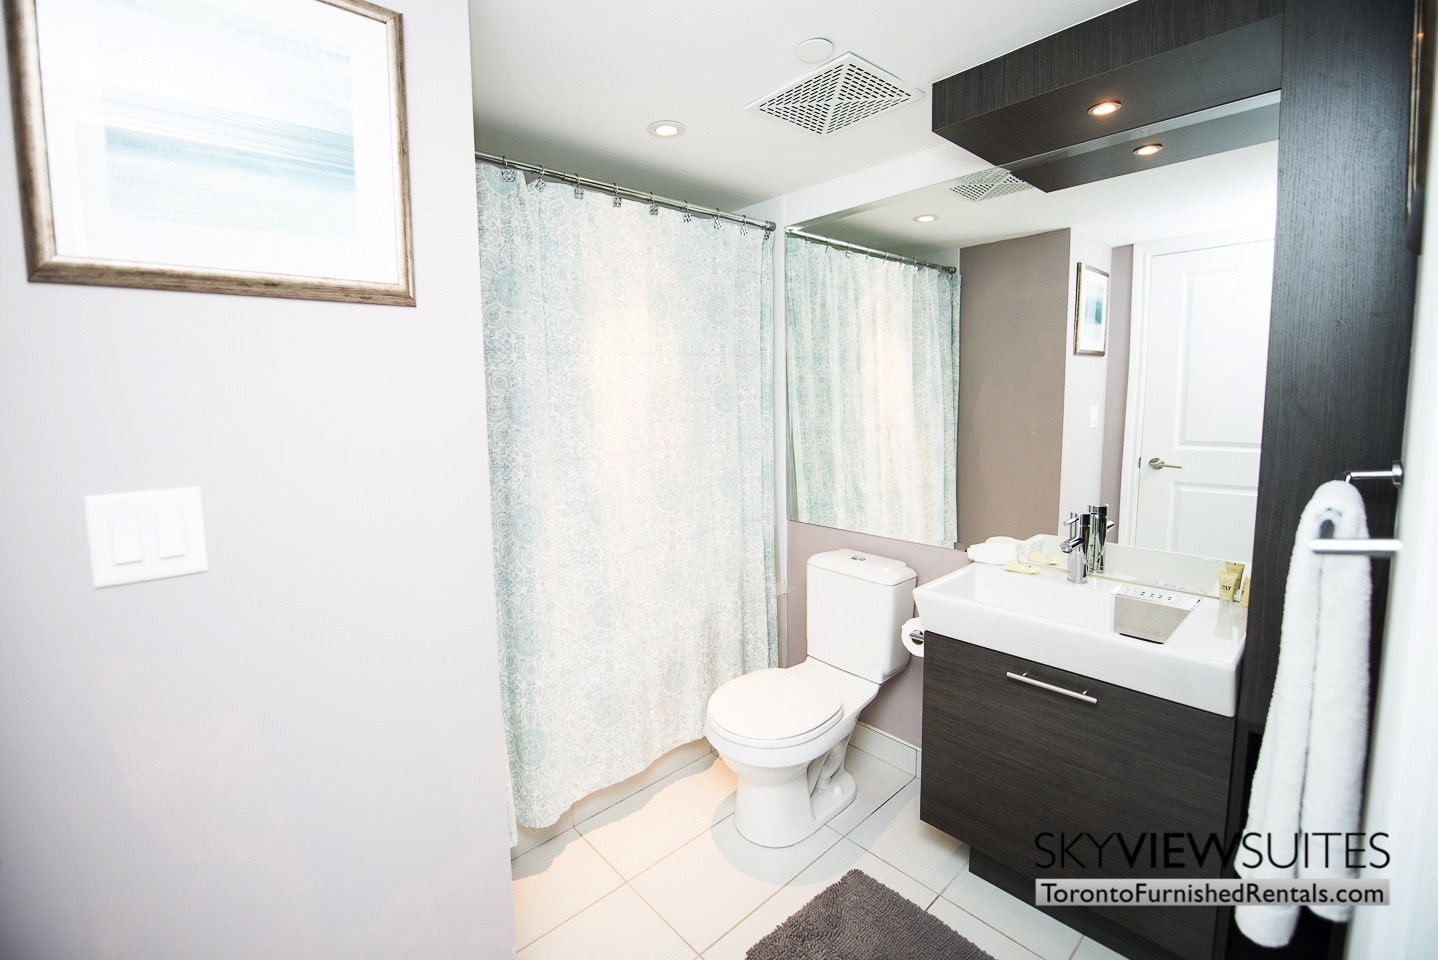 furnished-rentals-toronto-bathroom-college